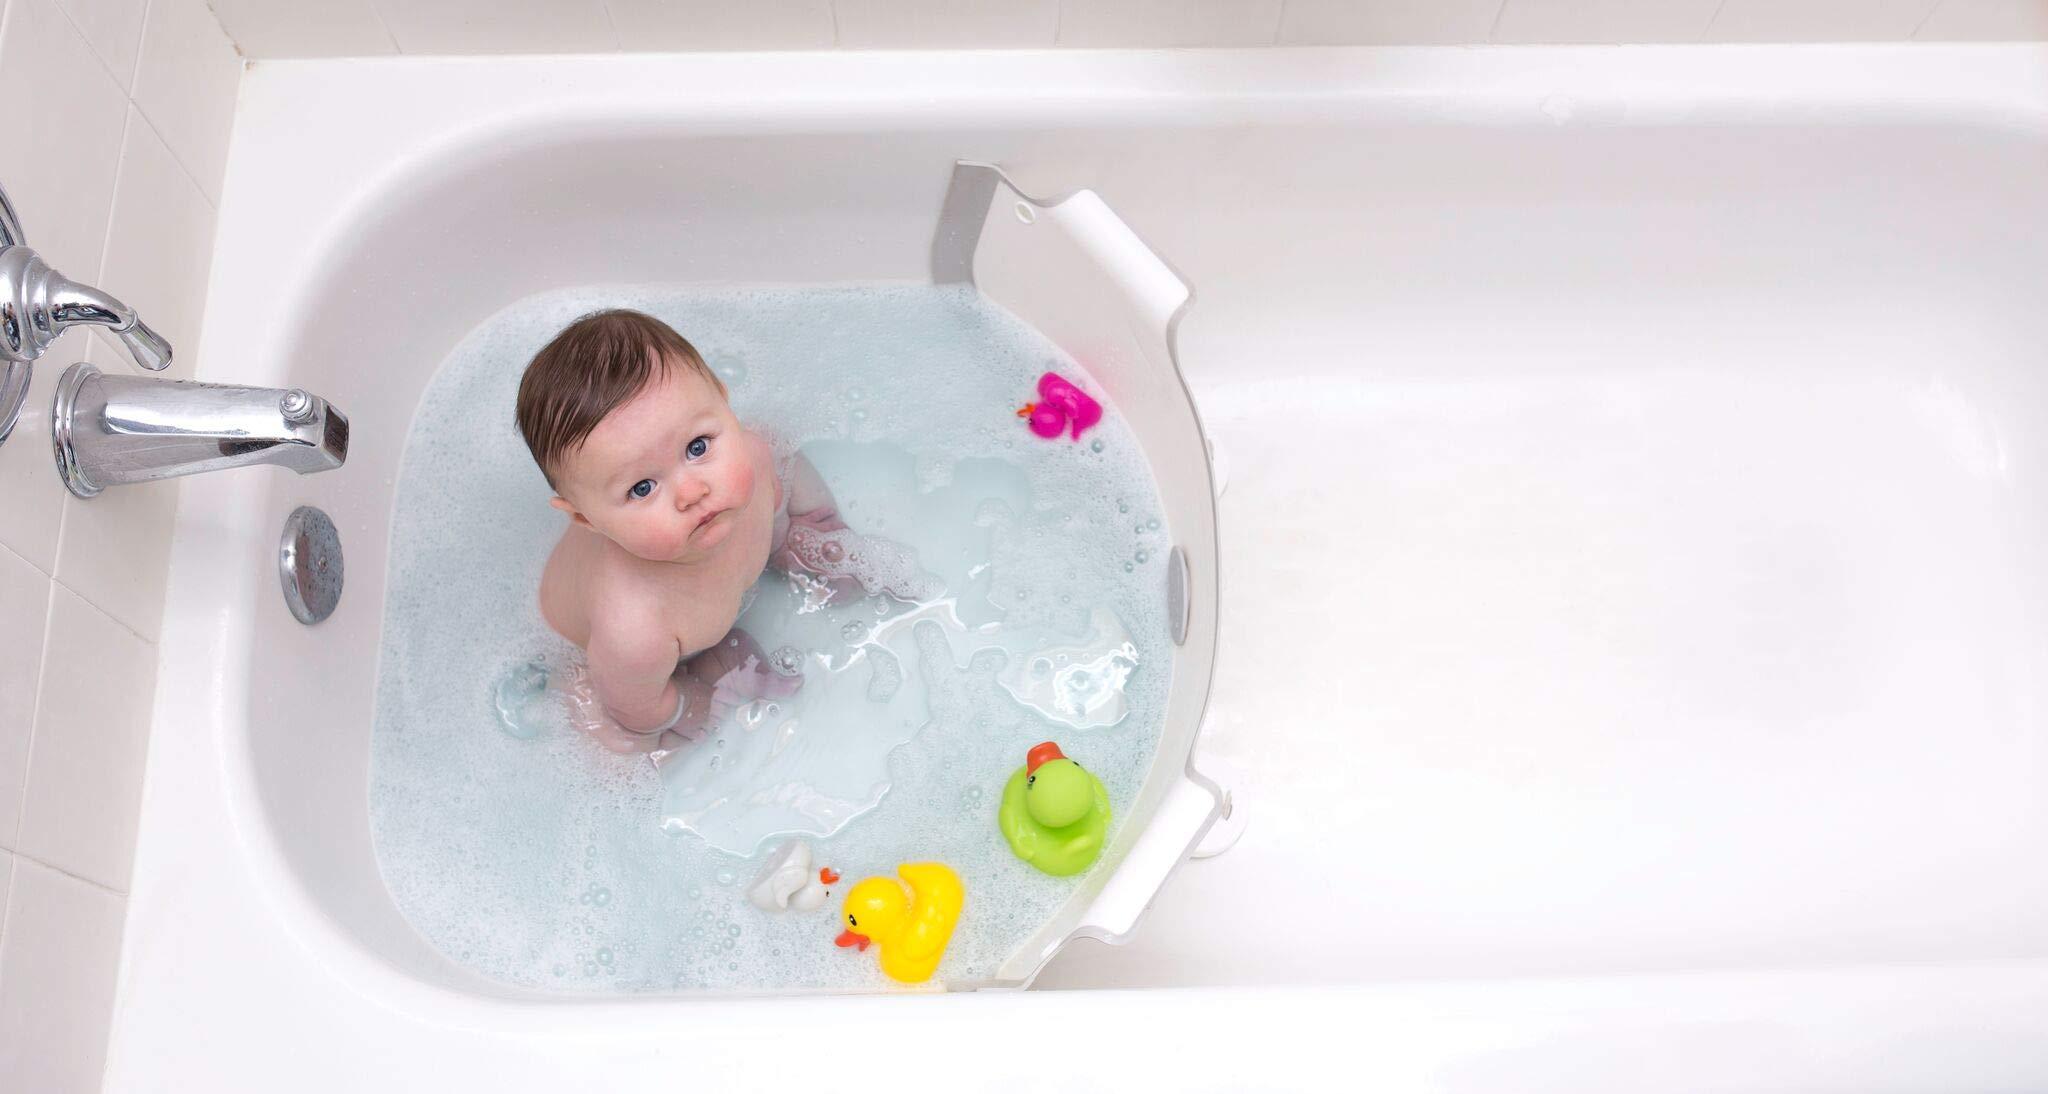 BabyDam Bathwater Barrier, Converts a Standard Non-Textured Bathtub to a Baby Bathtub by Baby Dam (Image #5)